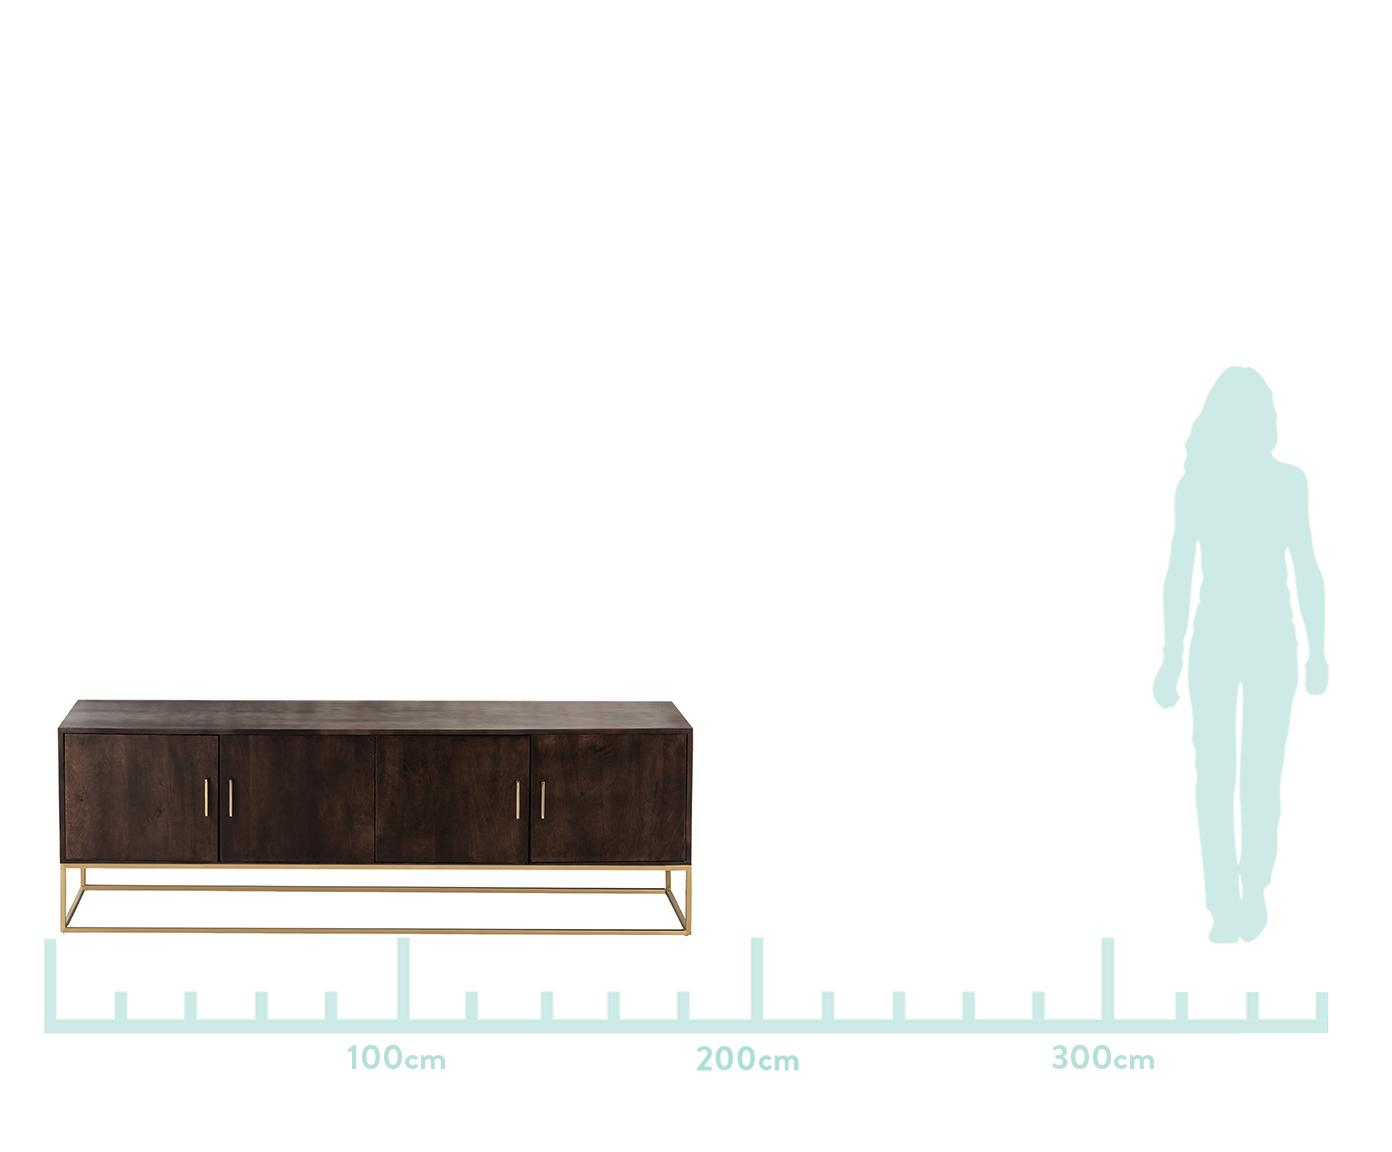 Lowboard Lyle mit Türen aus Massivholz, Korpus: Massives Mangoholz, lacki, Mangoholz, dunkel lackiert, 180 x 60 cm